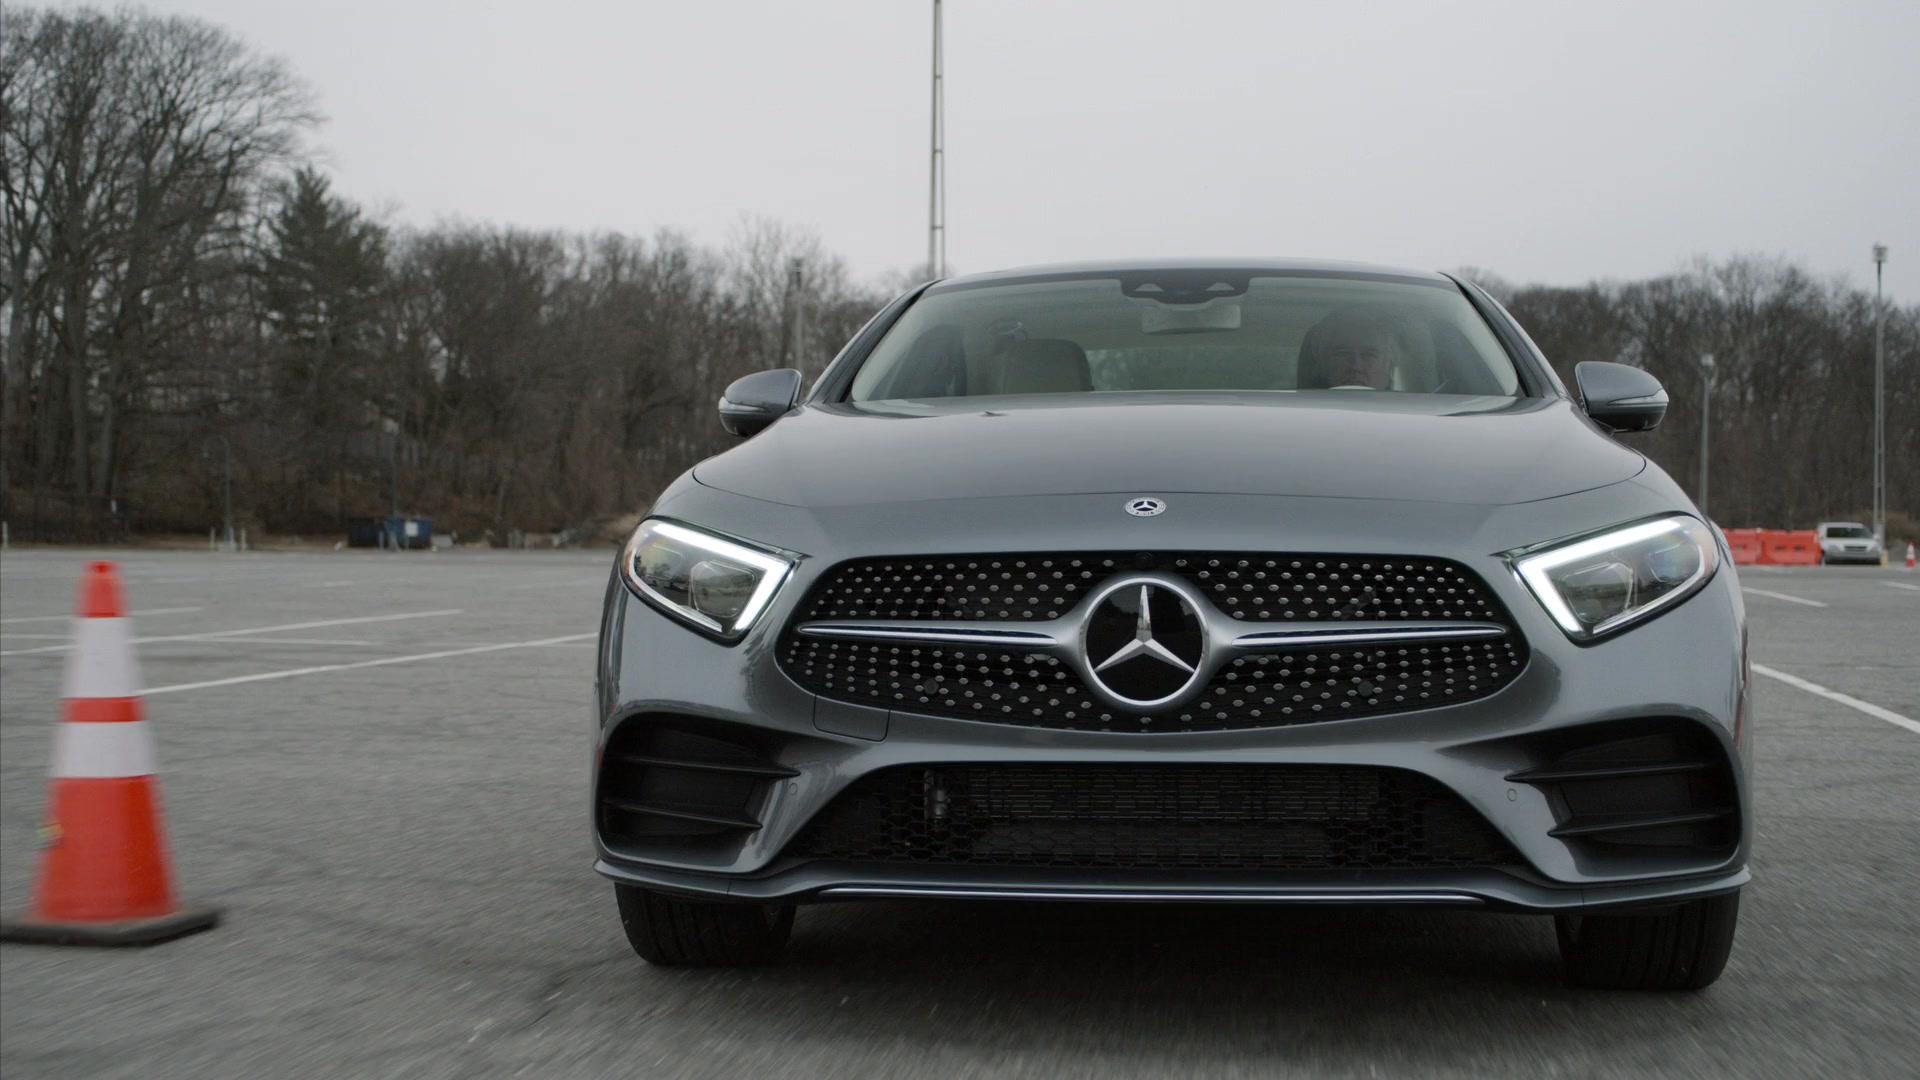 Mercedes-Benz CLS 450 Car In The Blacklist